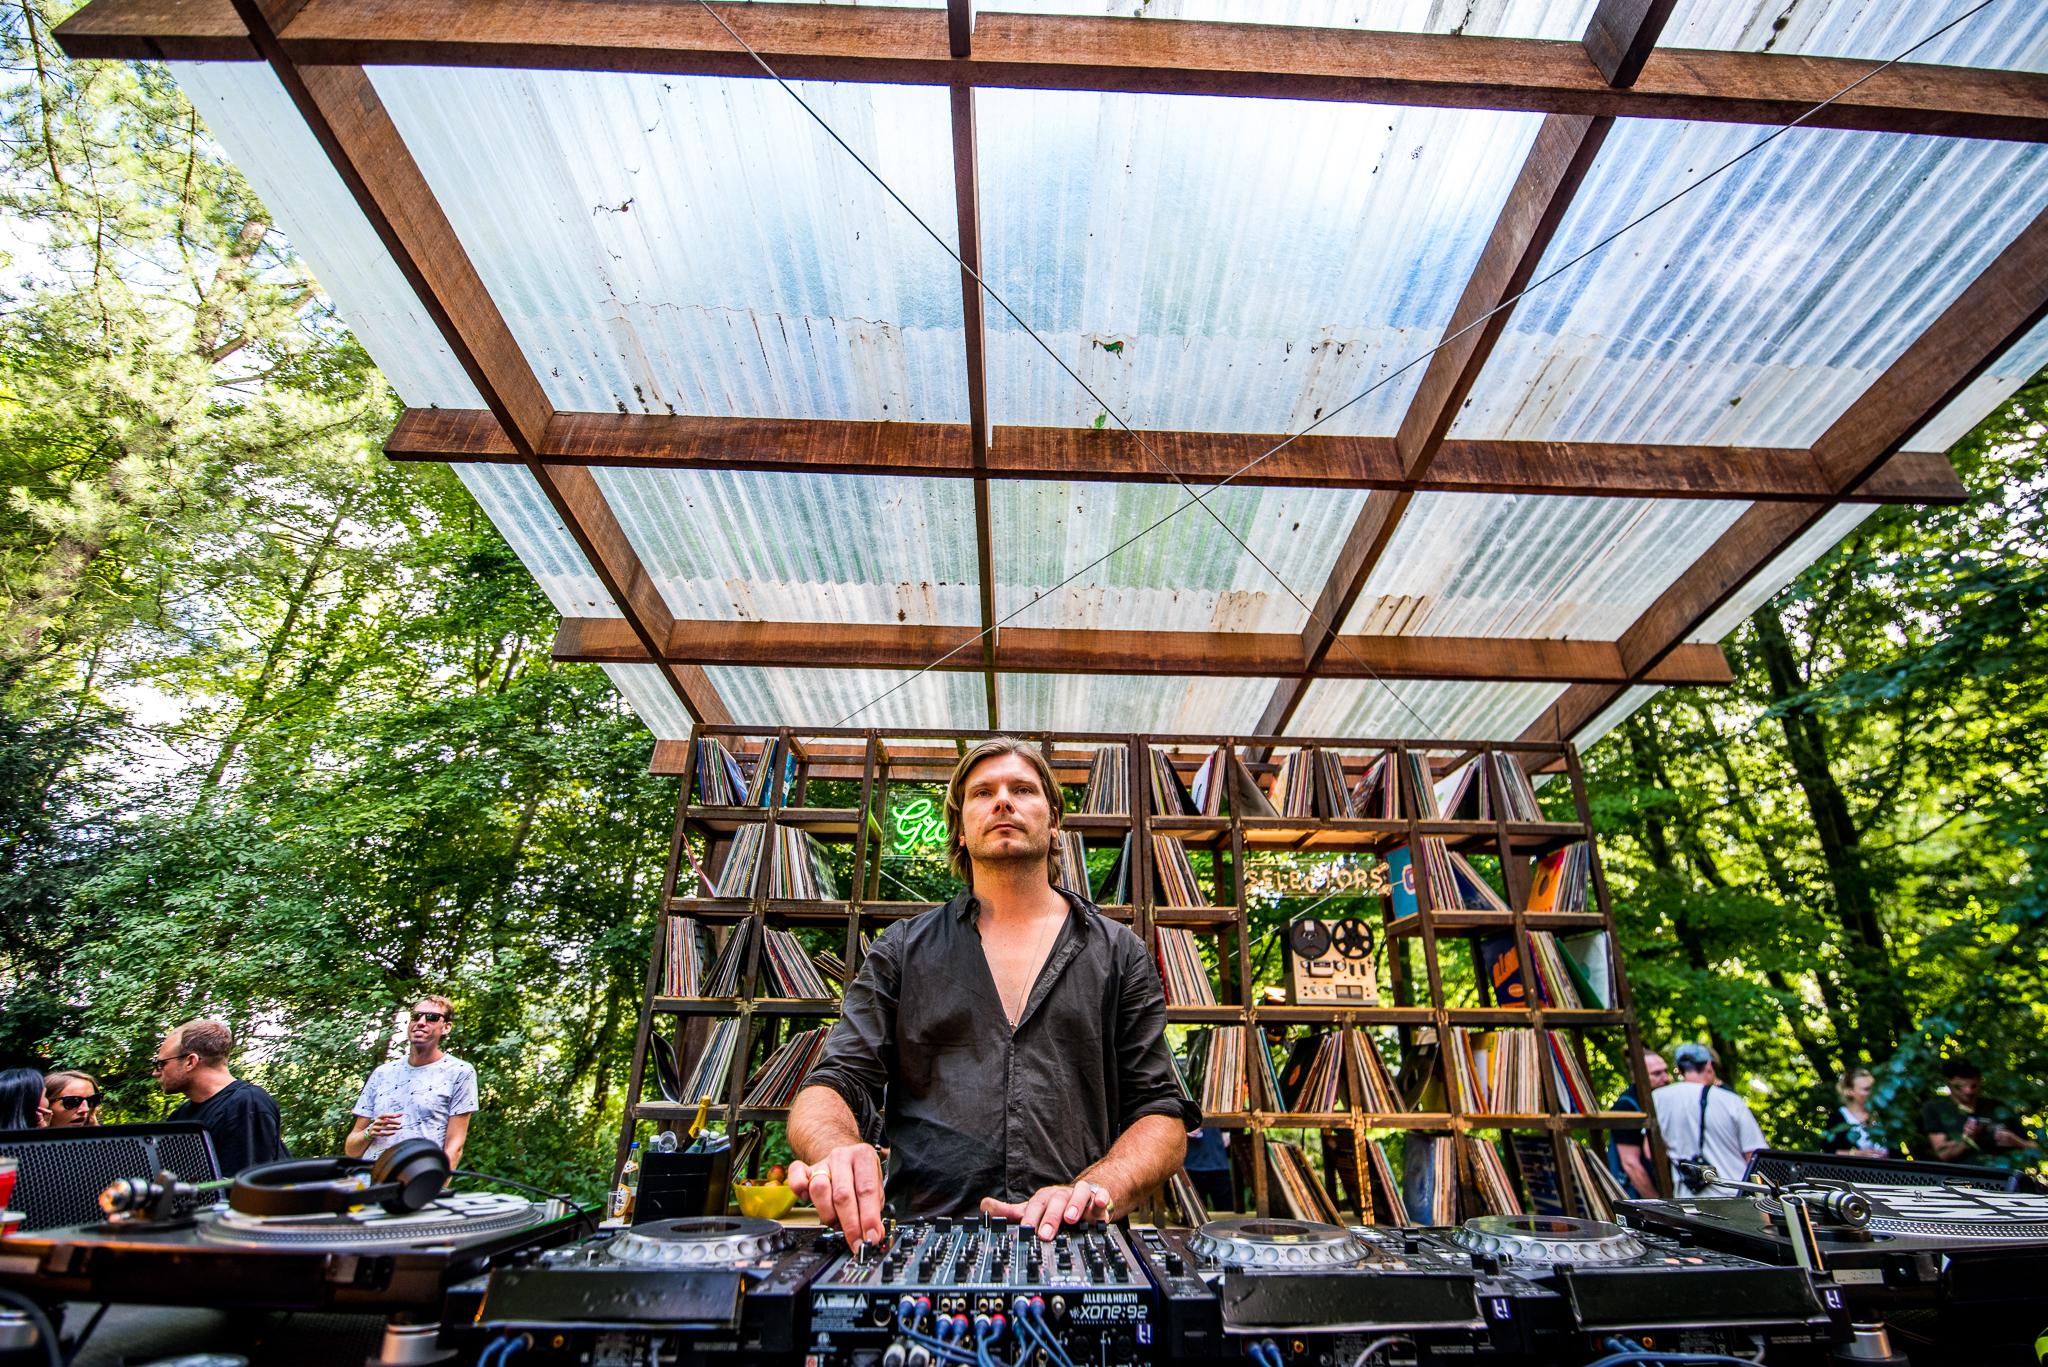 Marcel Dettmann - Dekmantel Festival 2017 - Day 4 (credits - Yannick van de Wijngaert)